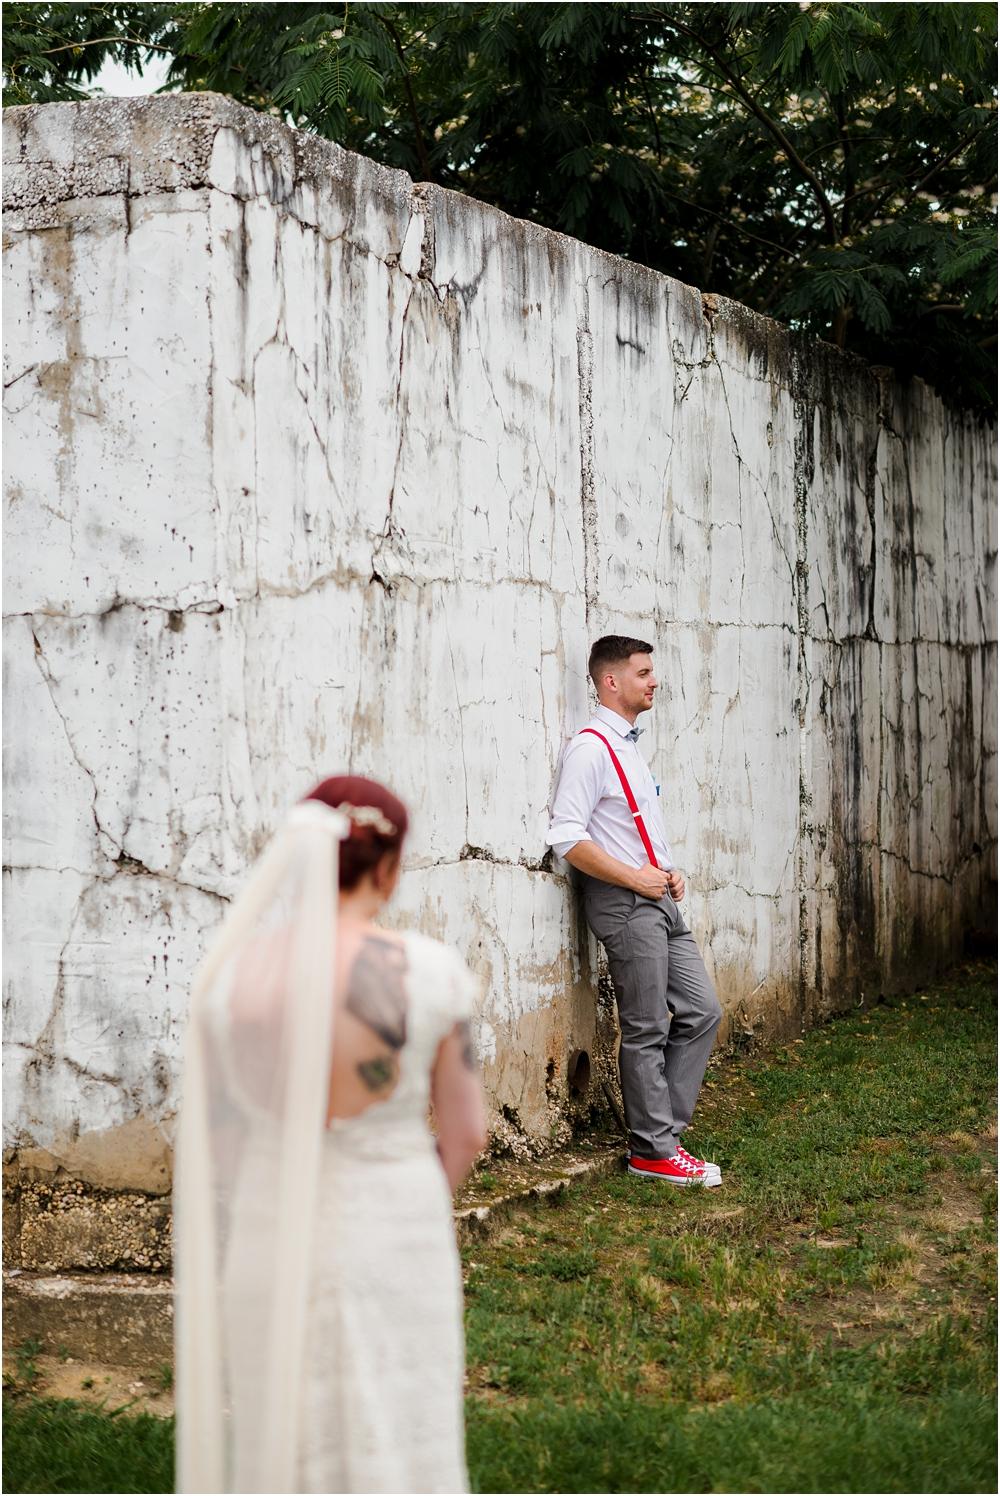 the-barn-at-wateroaks-circus-florida-wedding-photographer-kiersten-stevenson-photography-79.jpg